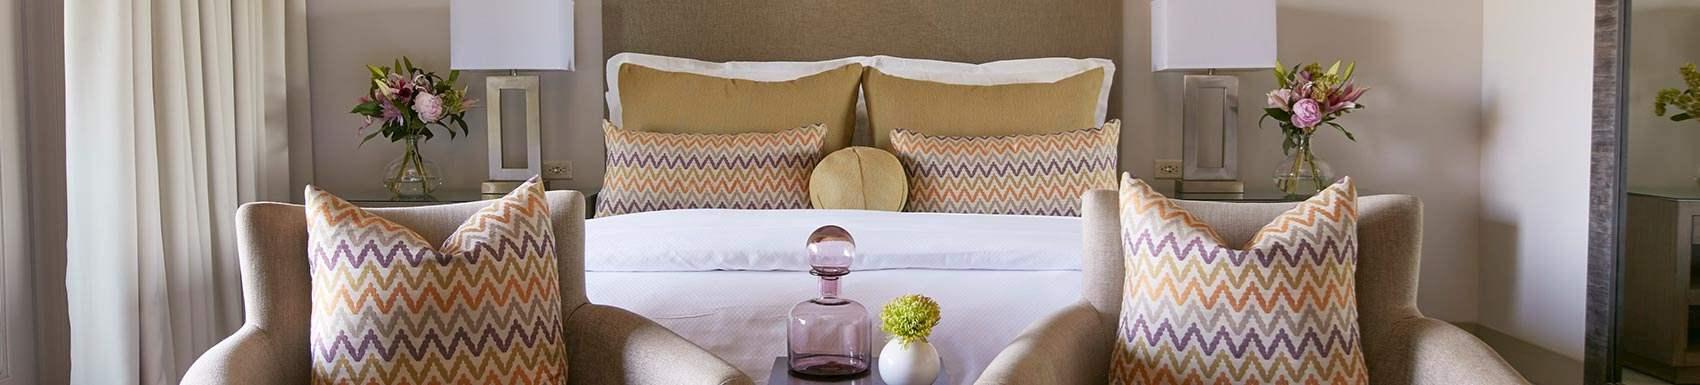 Prepay & Save Package in SENZA Hotel, Napa